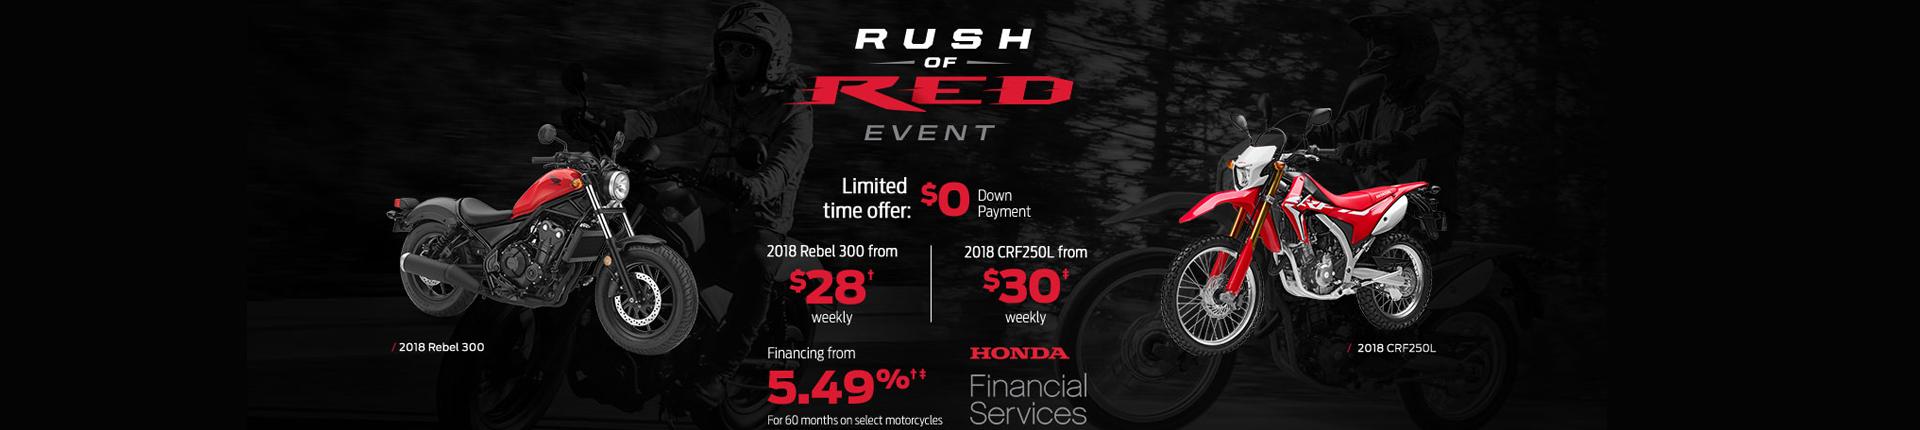 Honda: Rush the Red Event